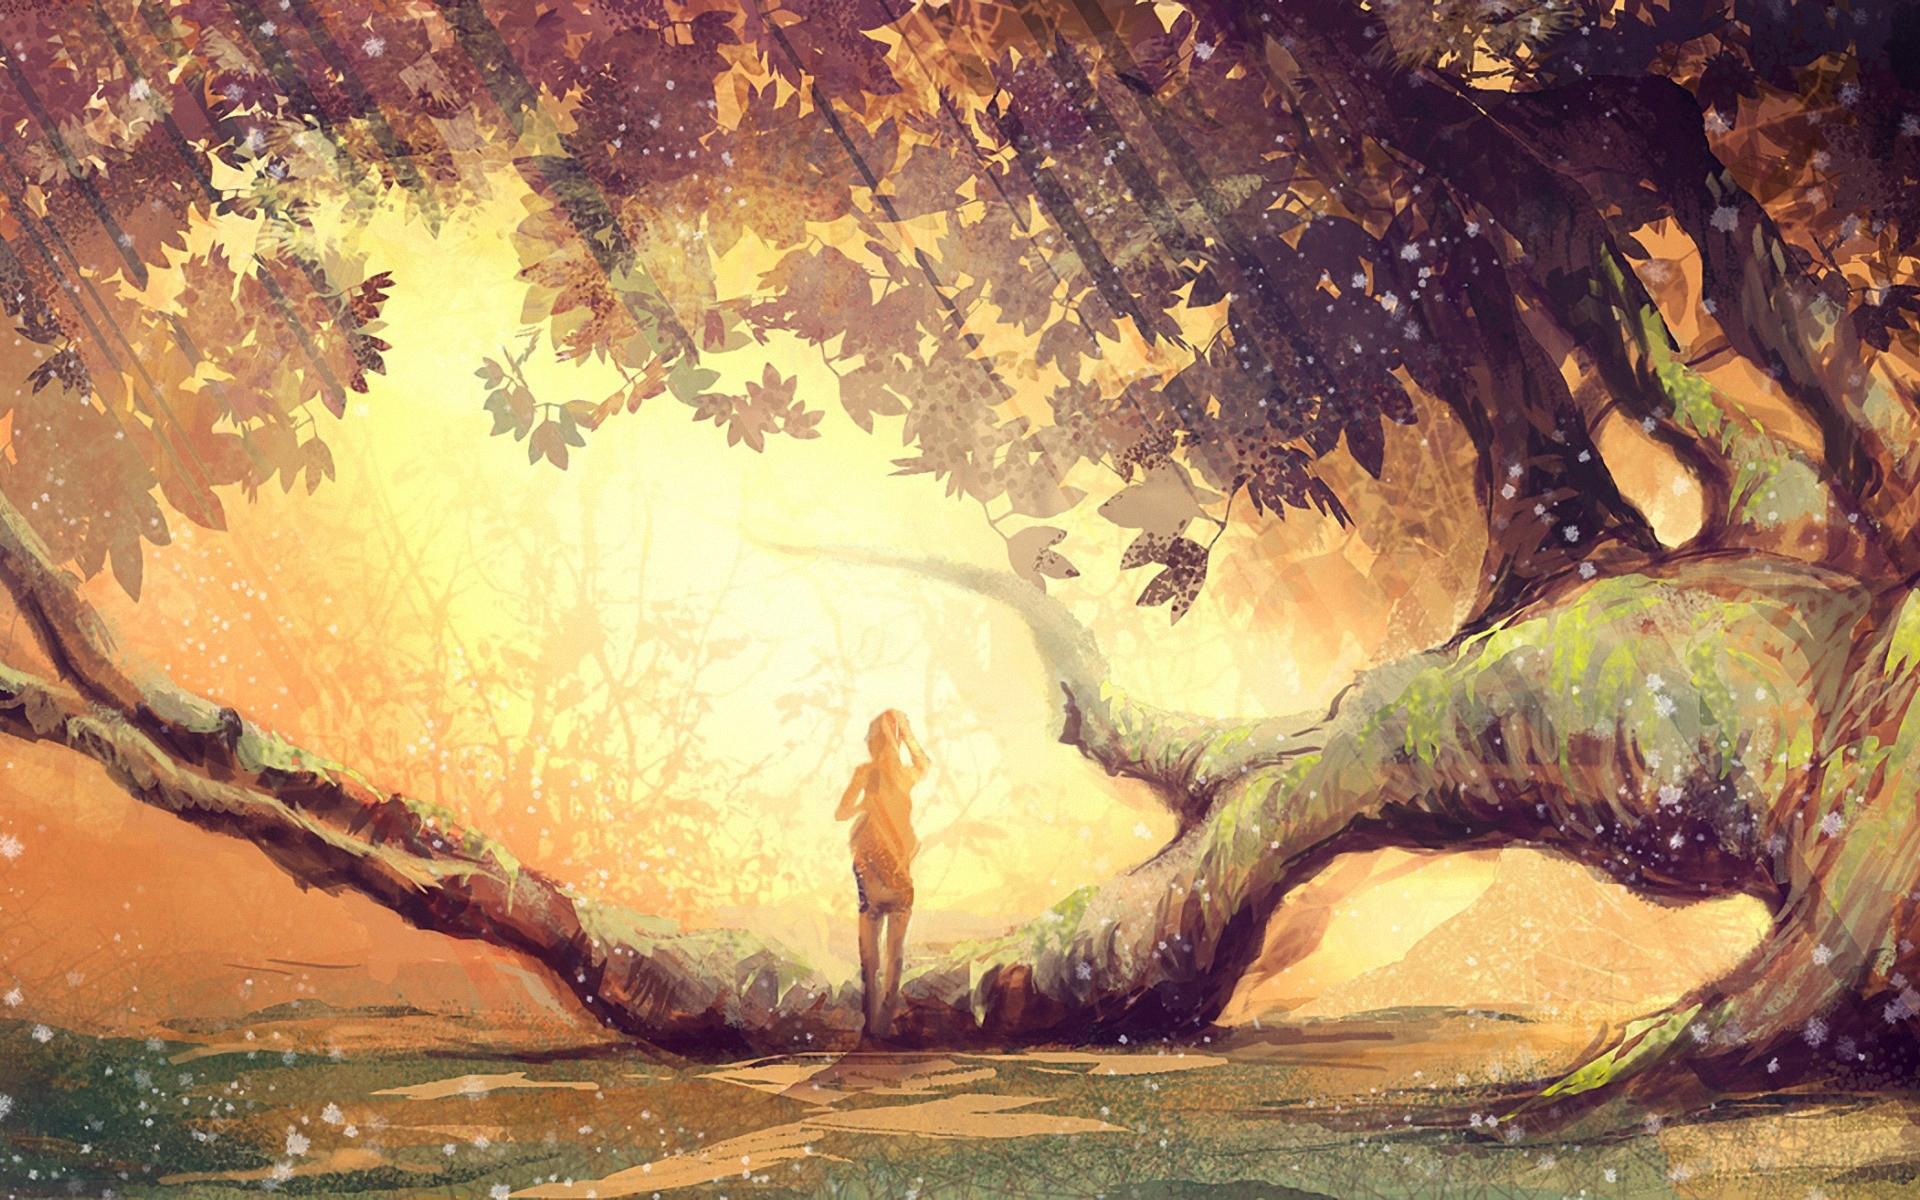 Anime Fall Season - HDWallpaperFX